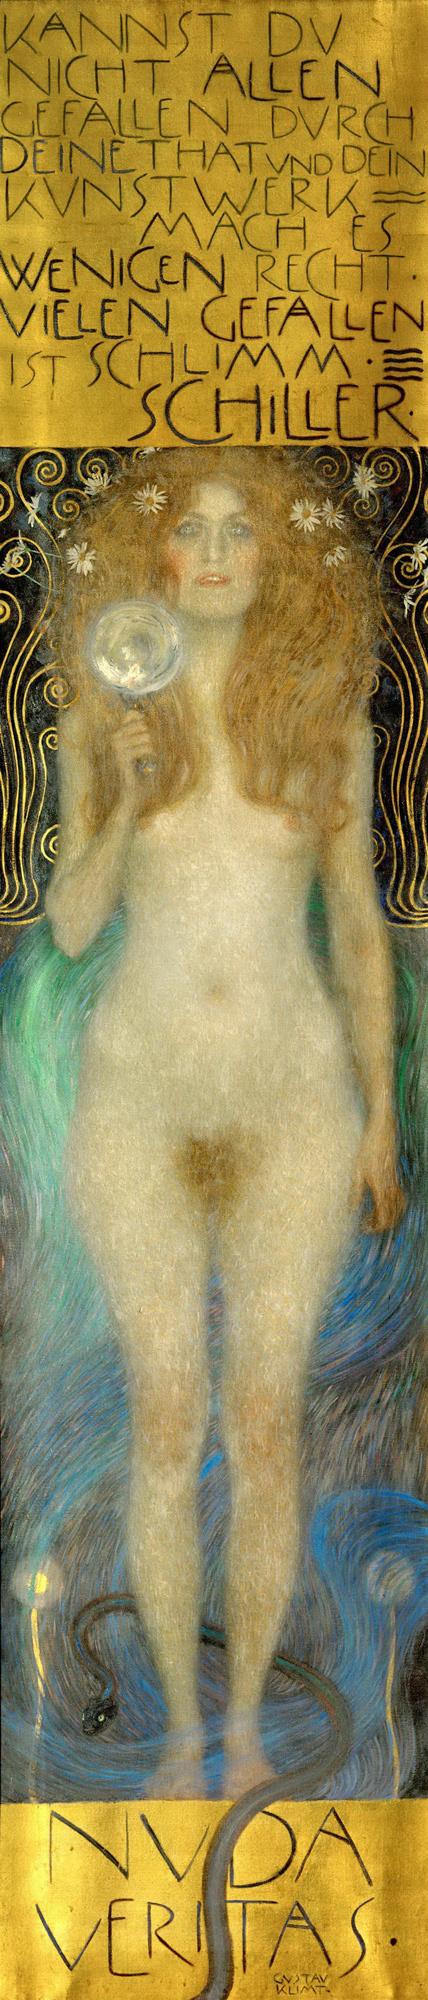 Nuda Veritas, by Gustav Klimt